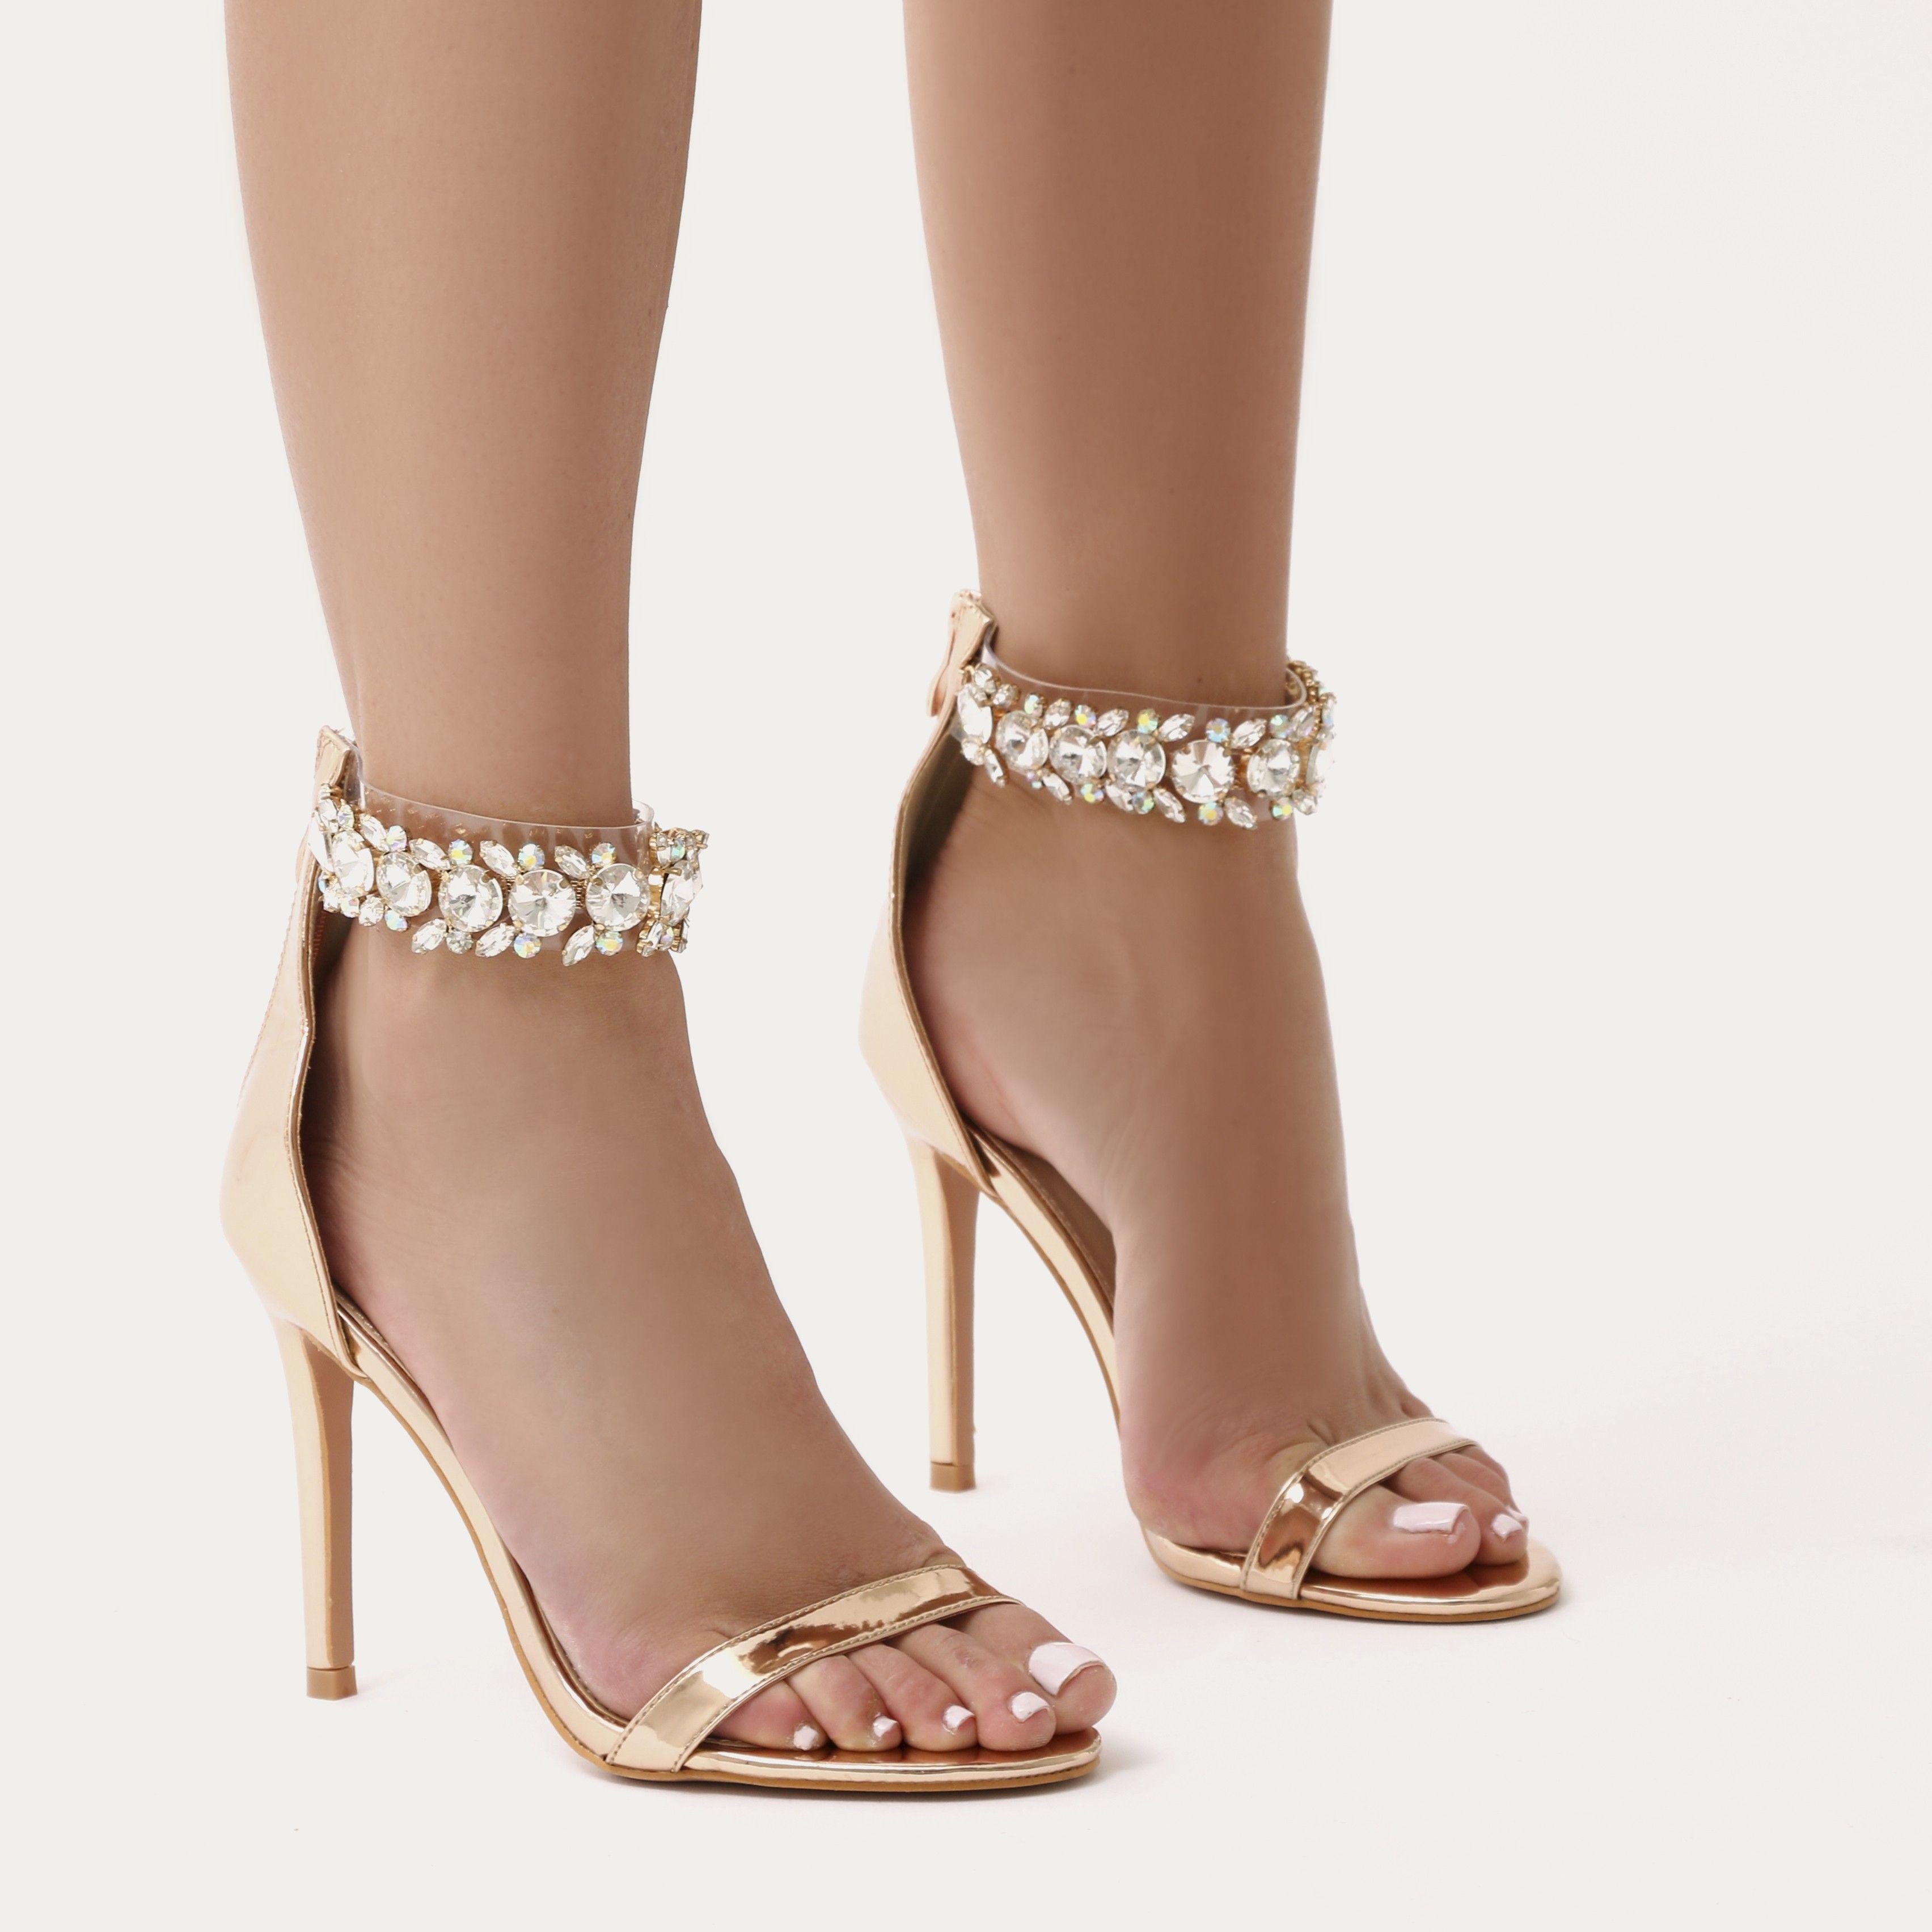 shoes to articles high make heel comforter stilettos ways comfortable